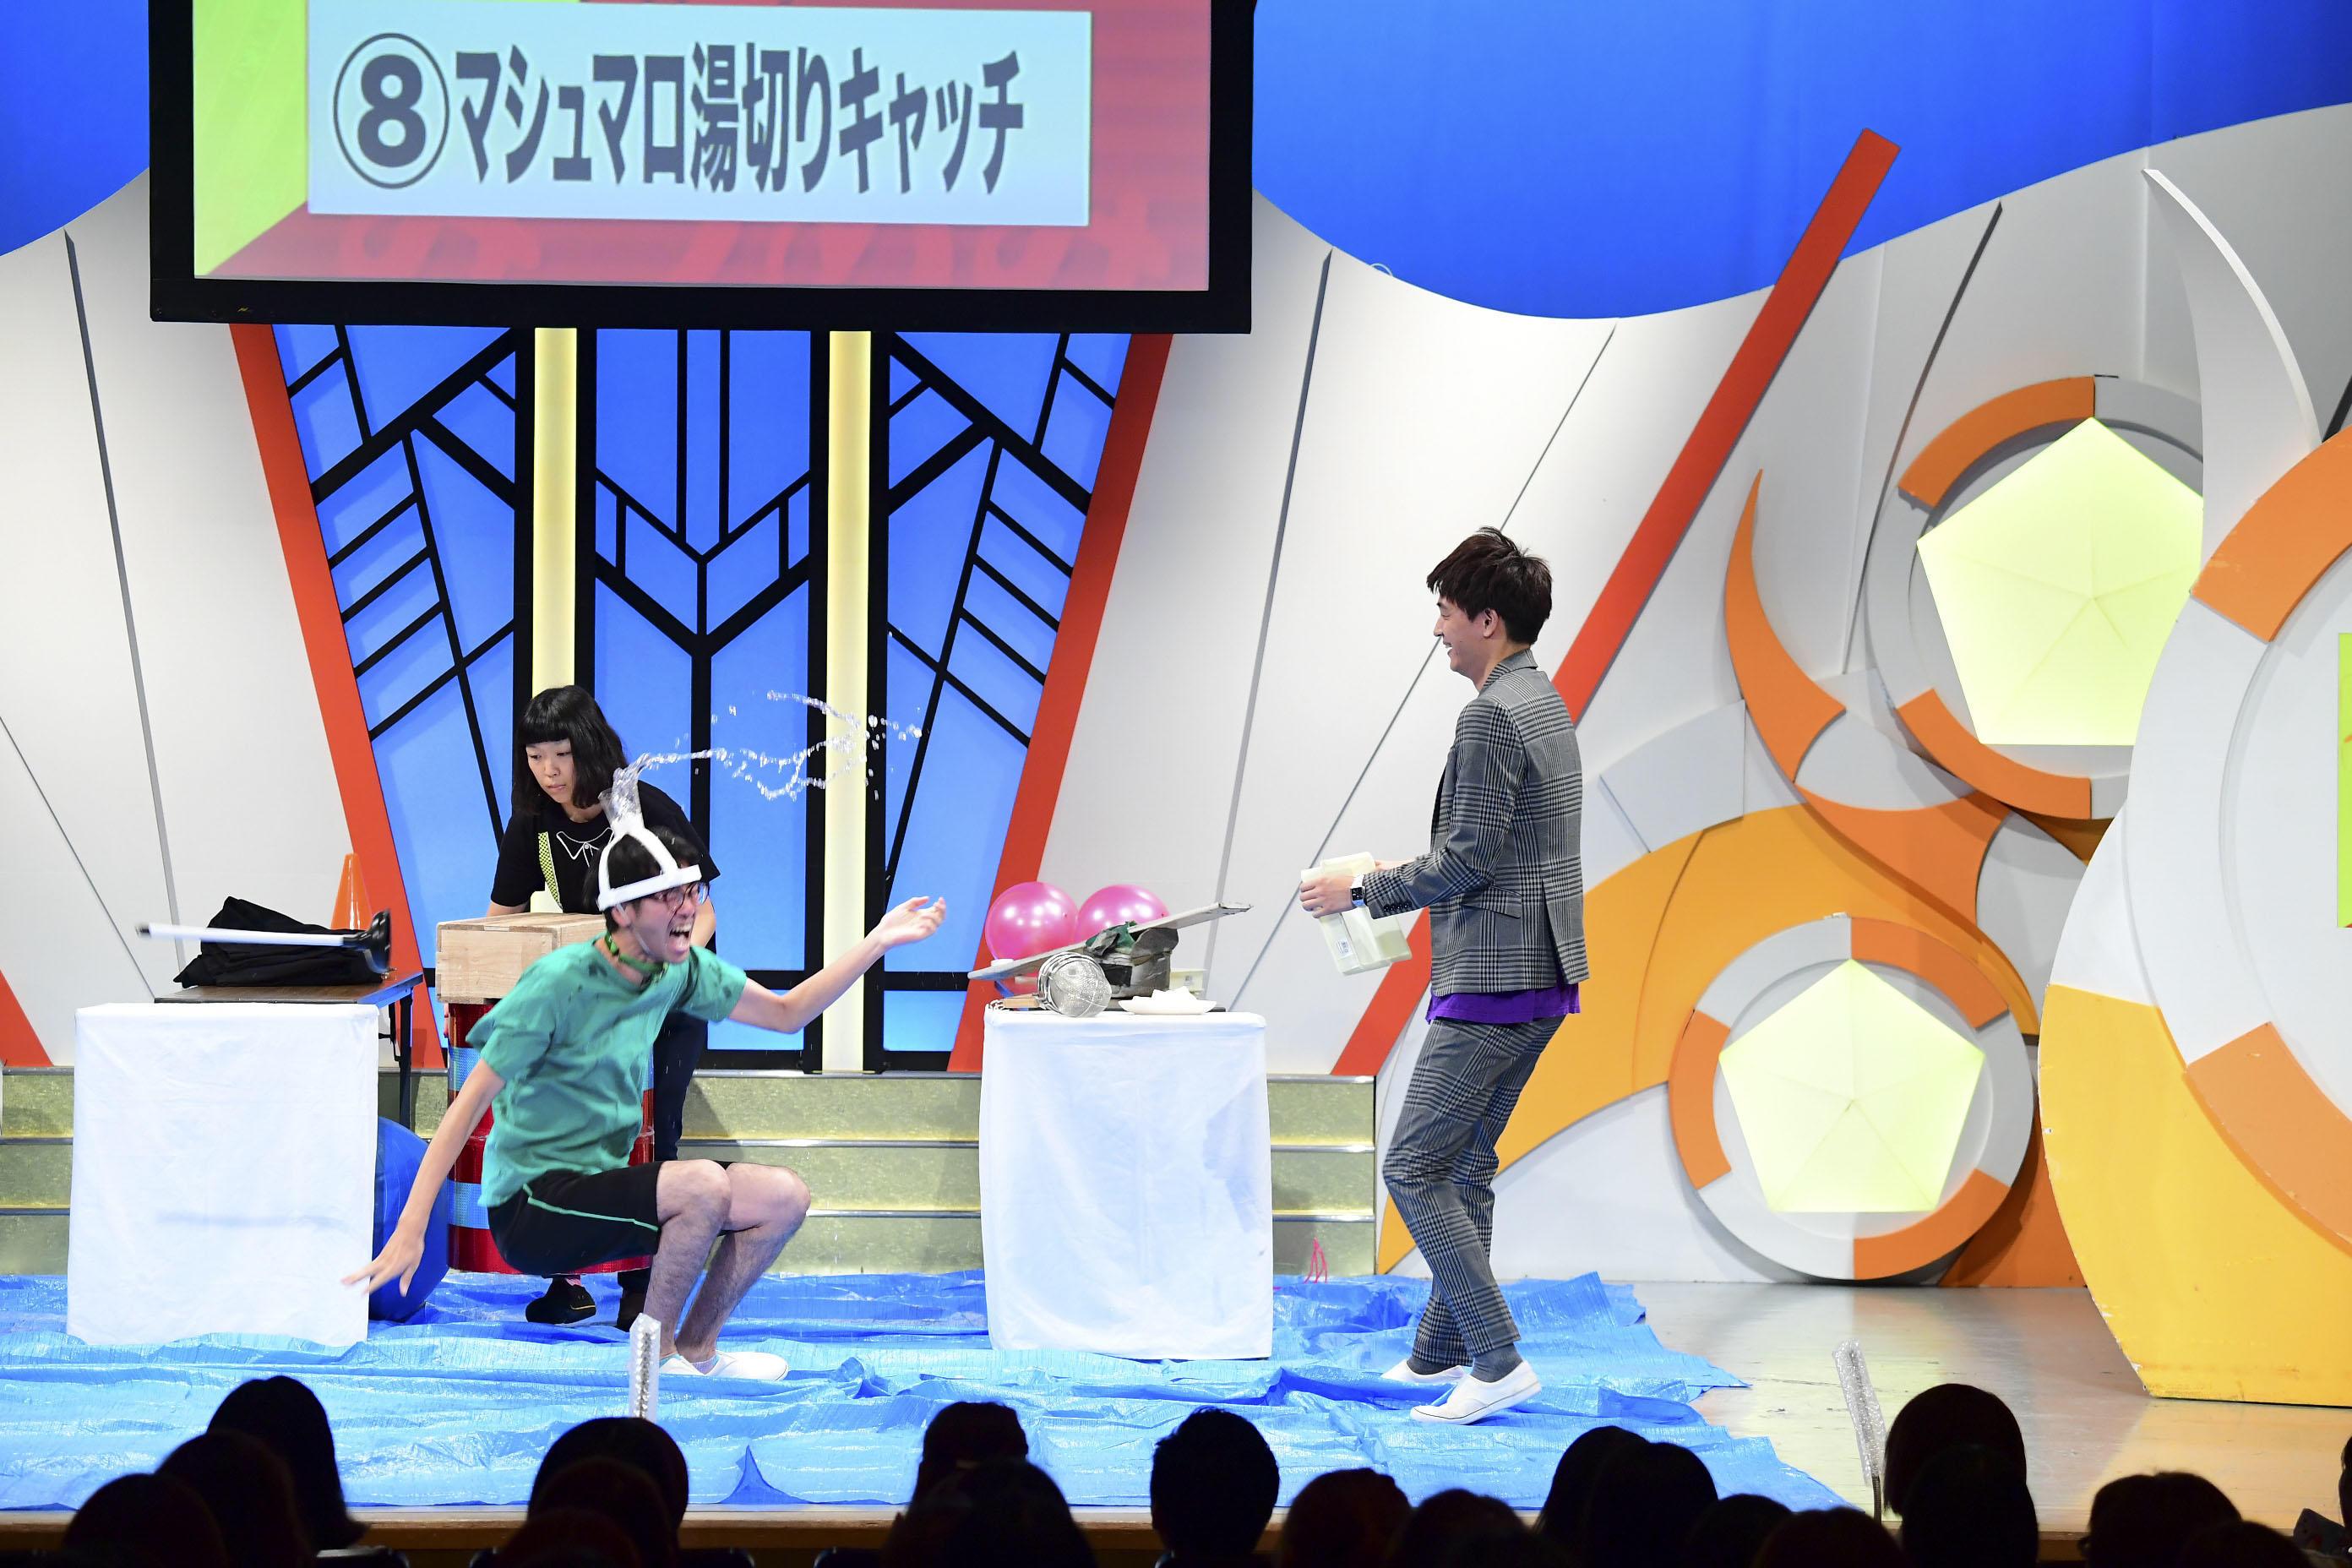 http://news.yoshimoto.co.jp/20170829144829-460d73eeadd1dfb22939edcd4ade92aa0c89e8be.jpg